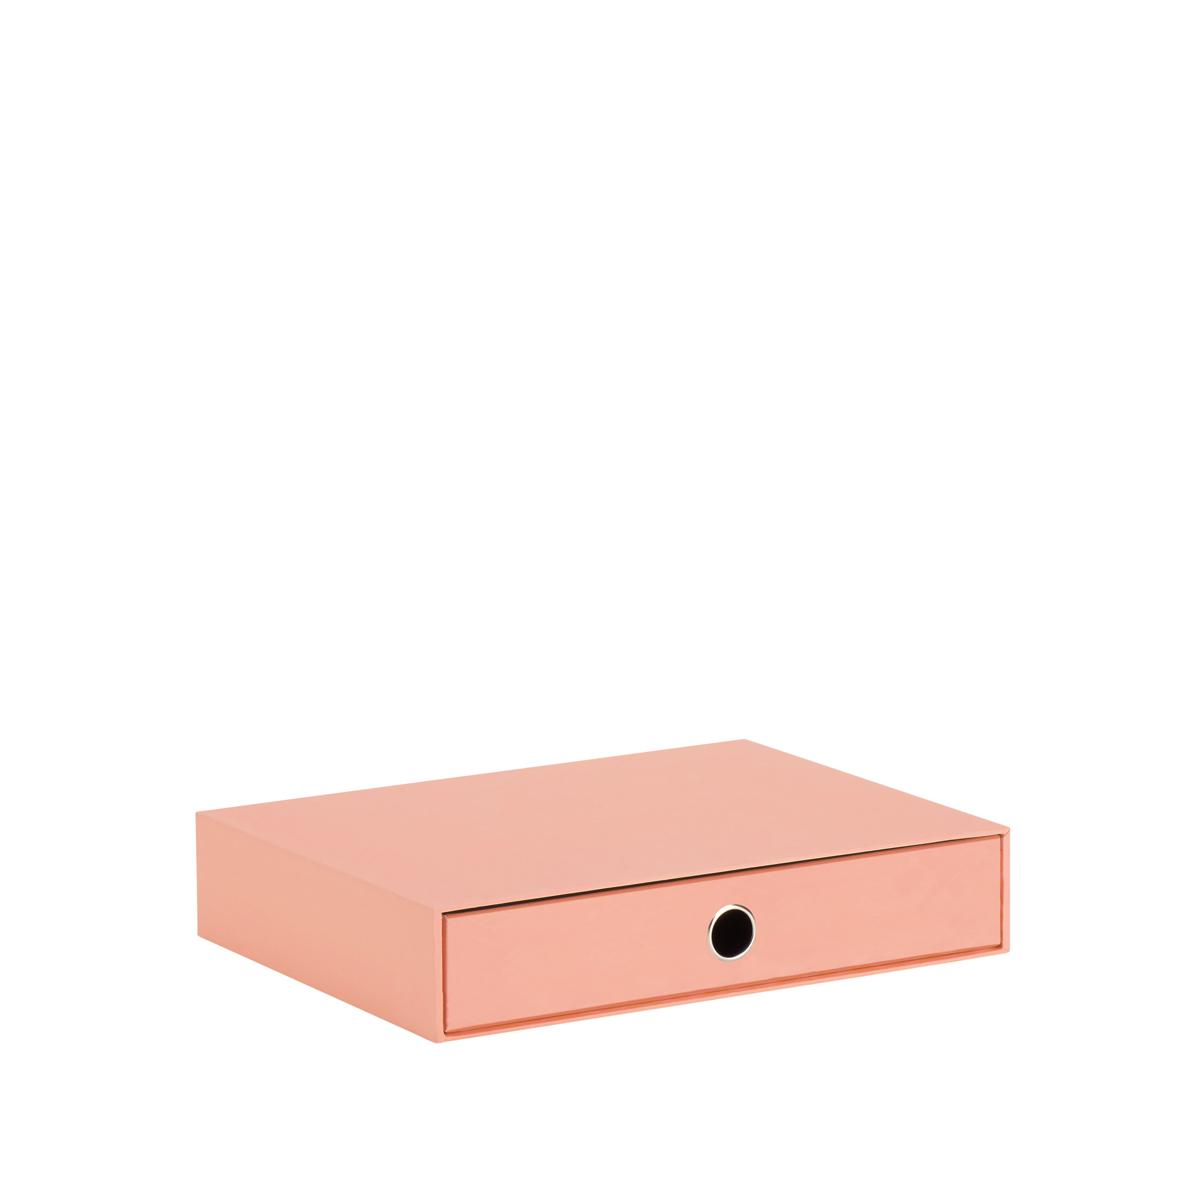 Büro Aufbewahrung rössler schubladenbox für din a4 aufbewahrung büro fresh salmon